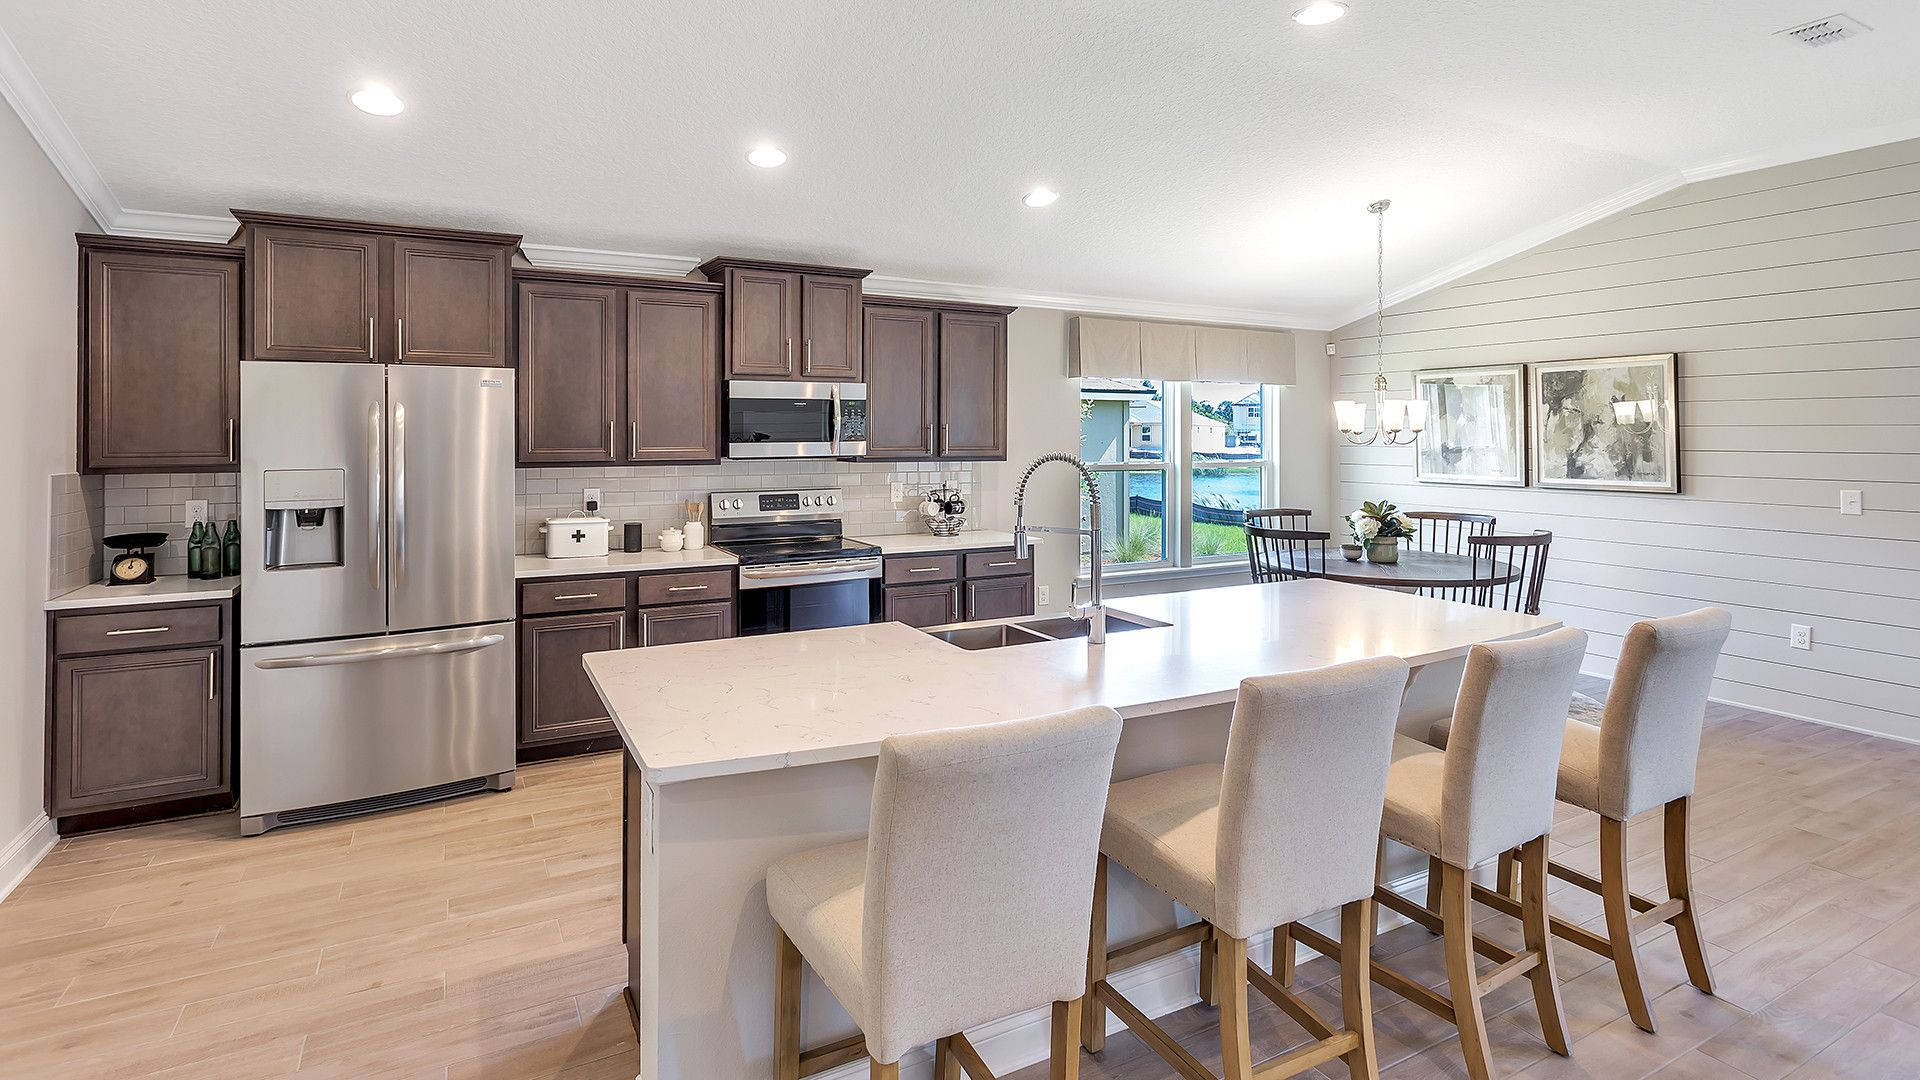 15 fresh lake house plans under 2000 square feet image